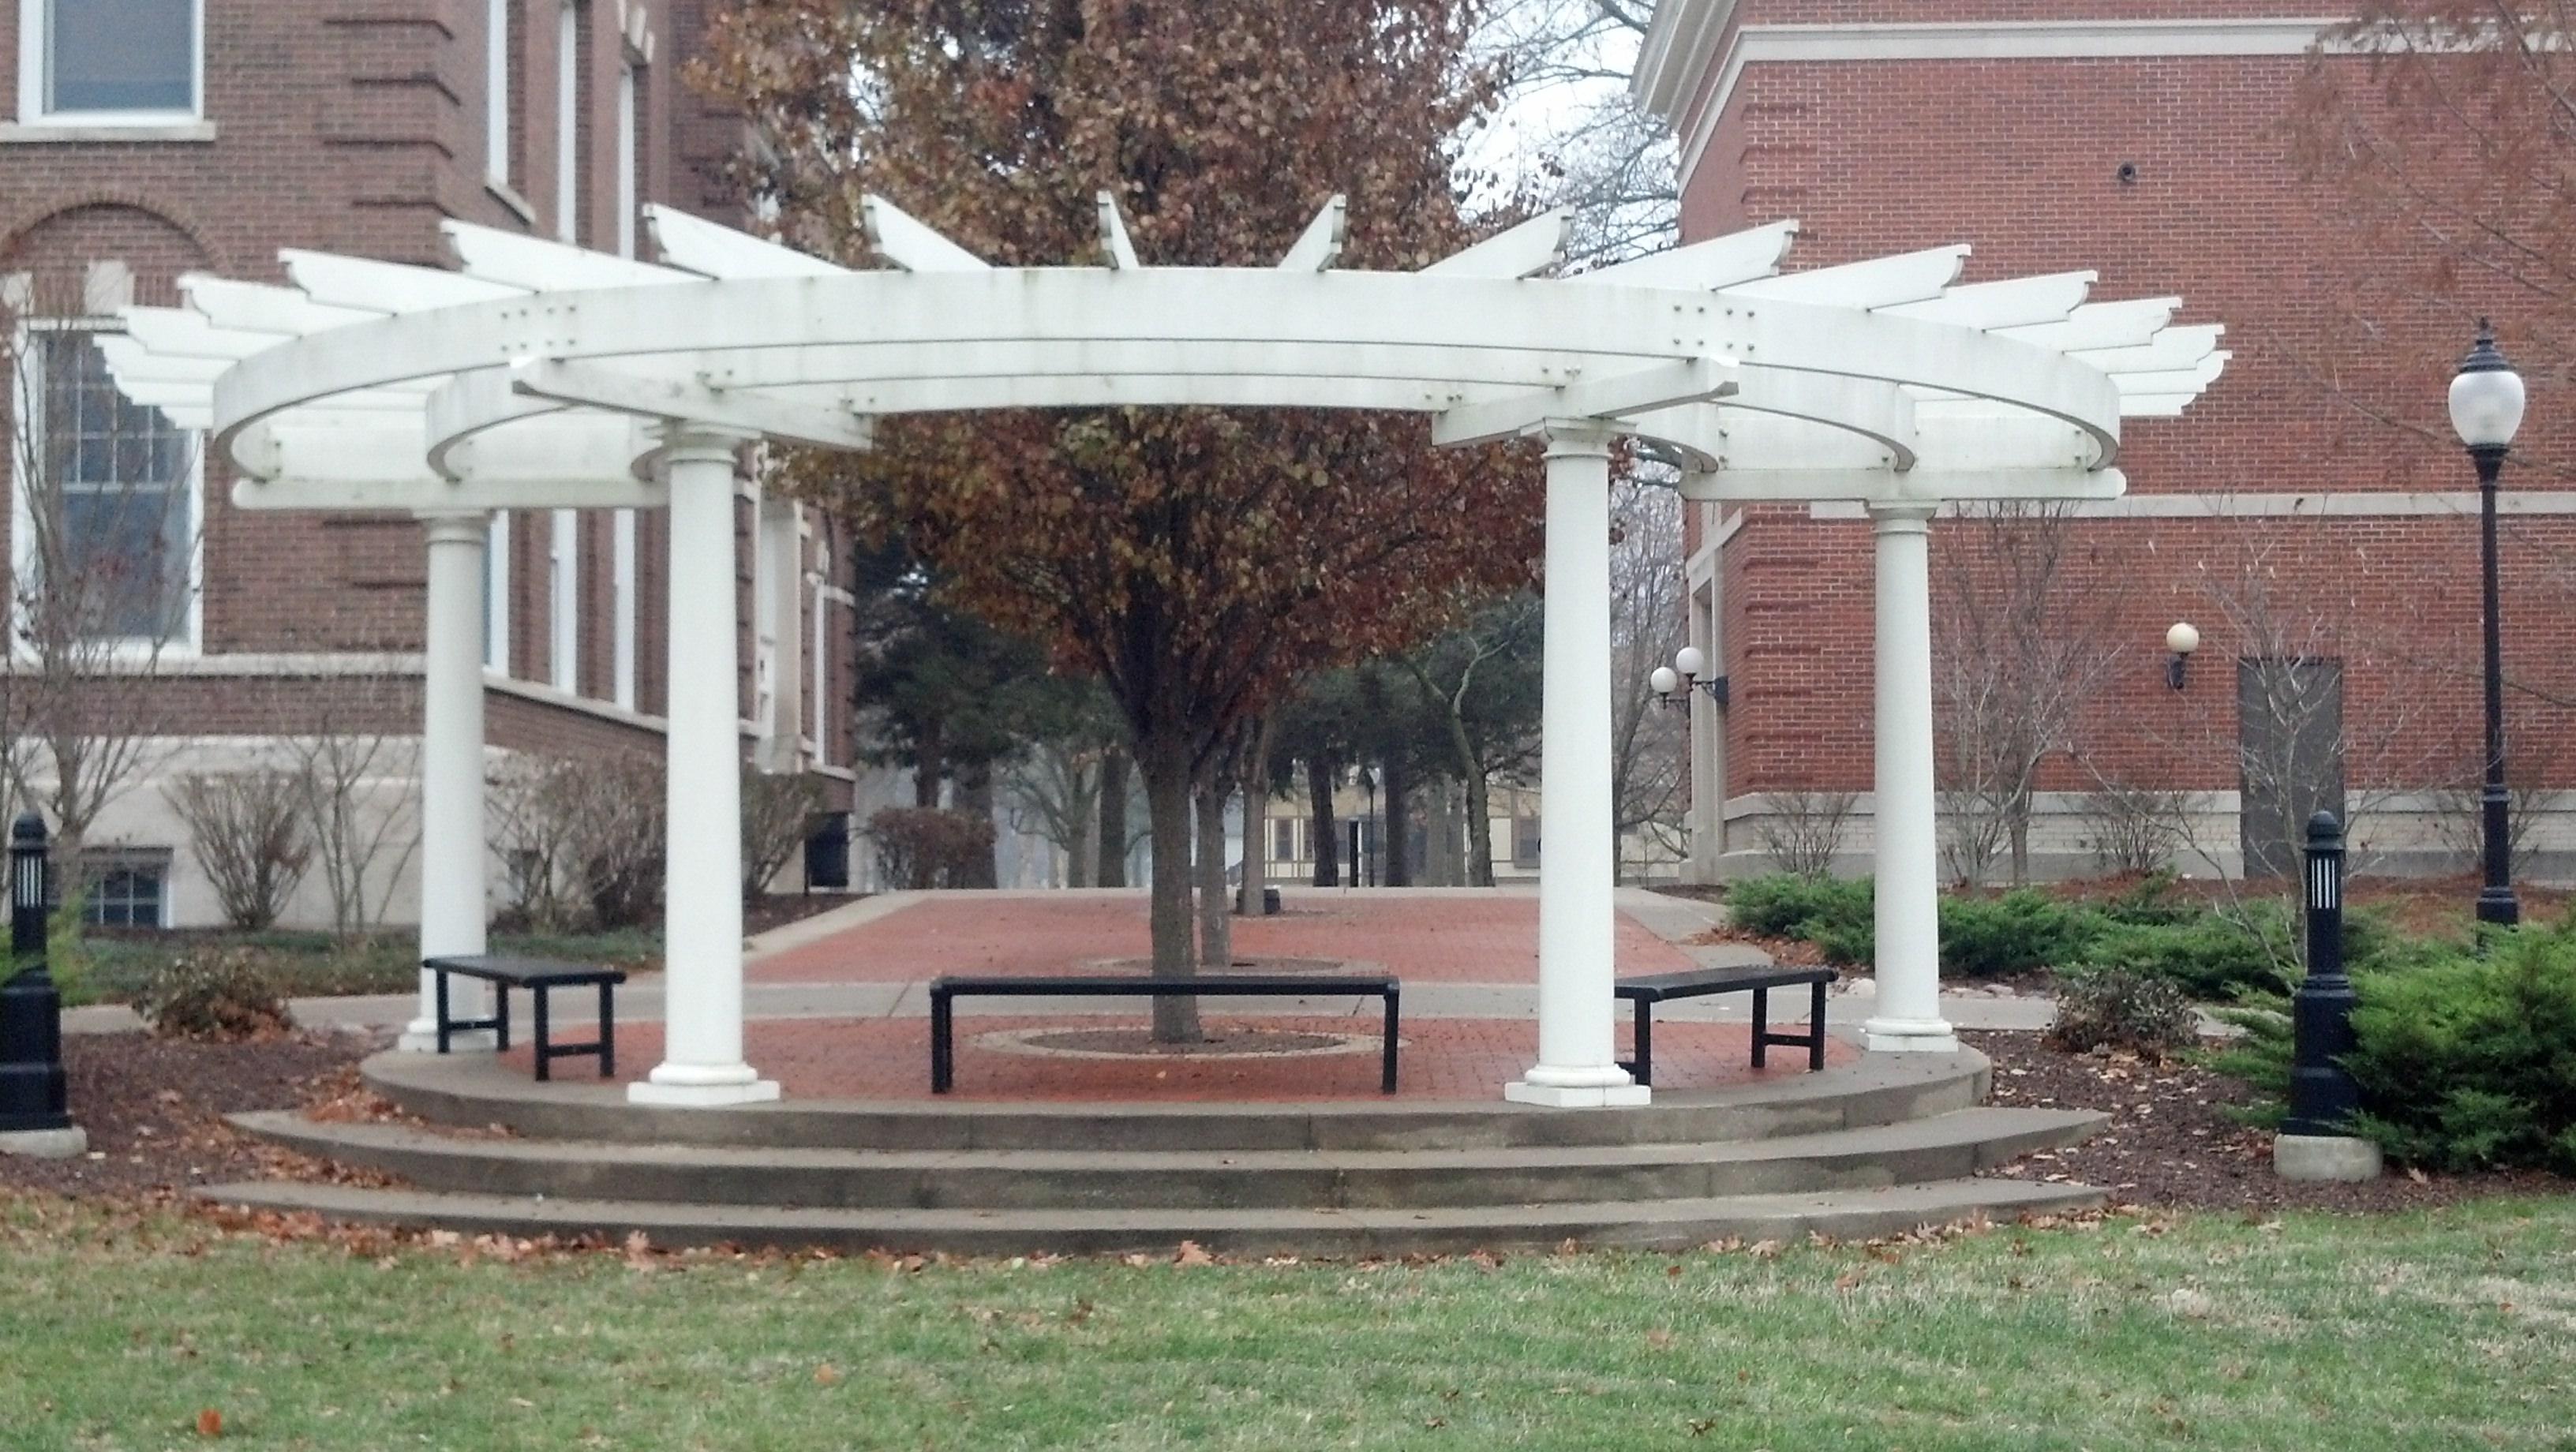 David Fleming Memorial at Monmouth College